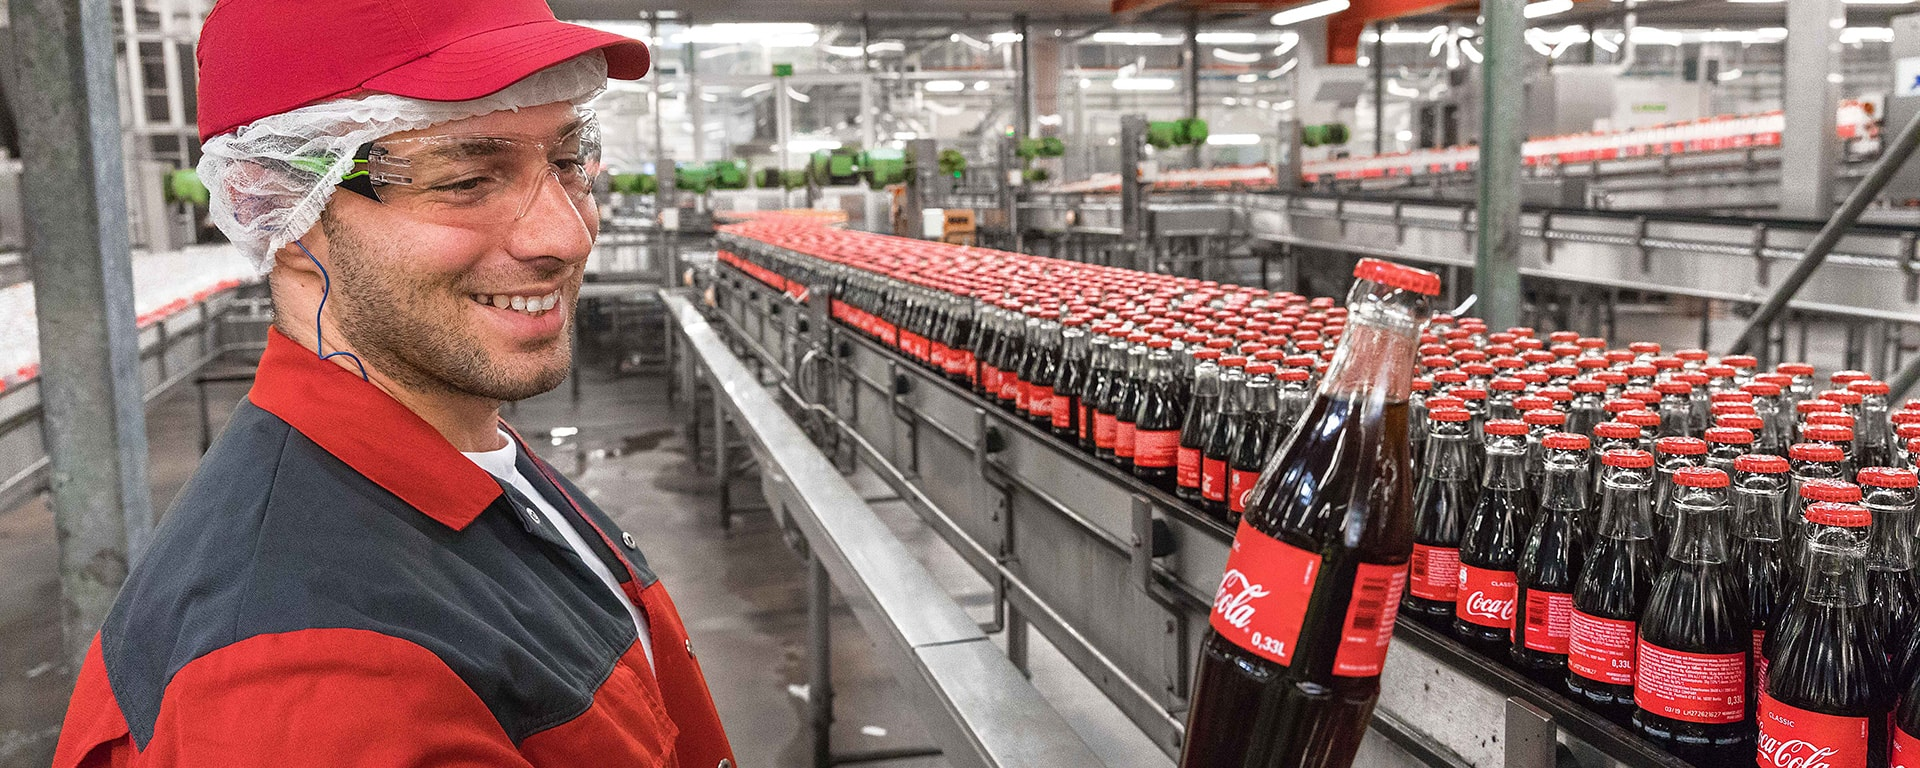 employee coca-cola bottles